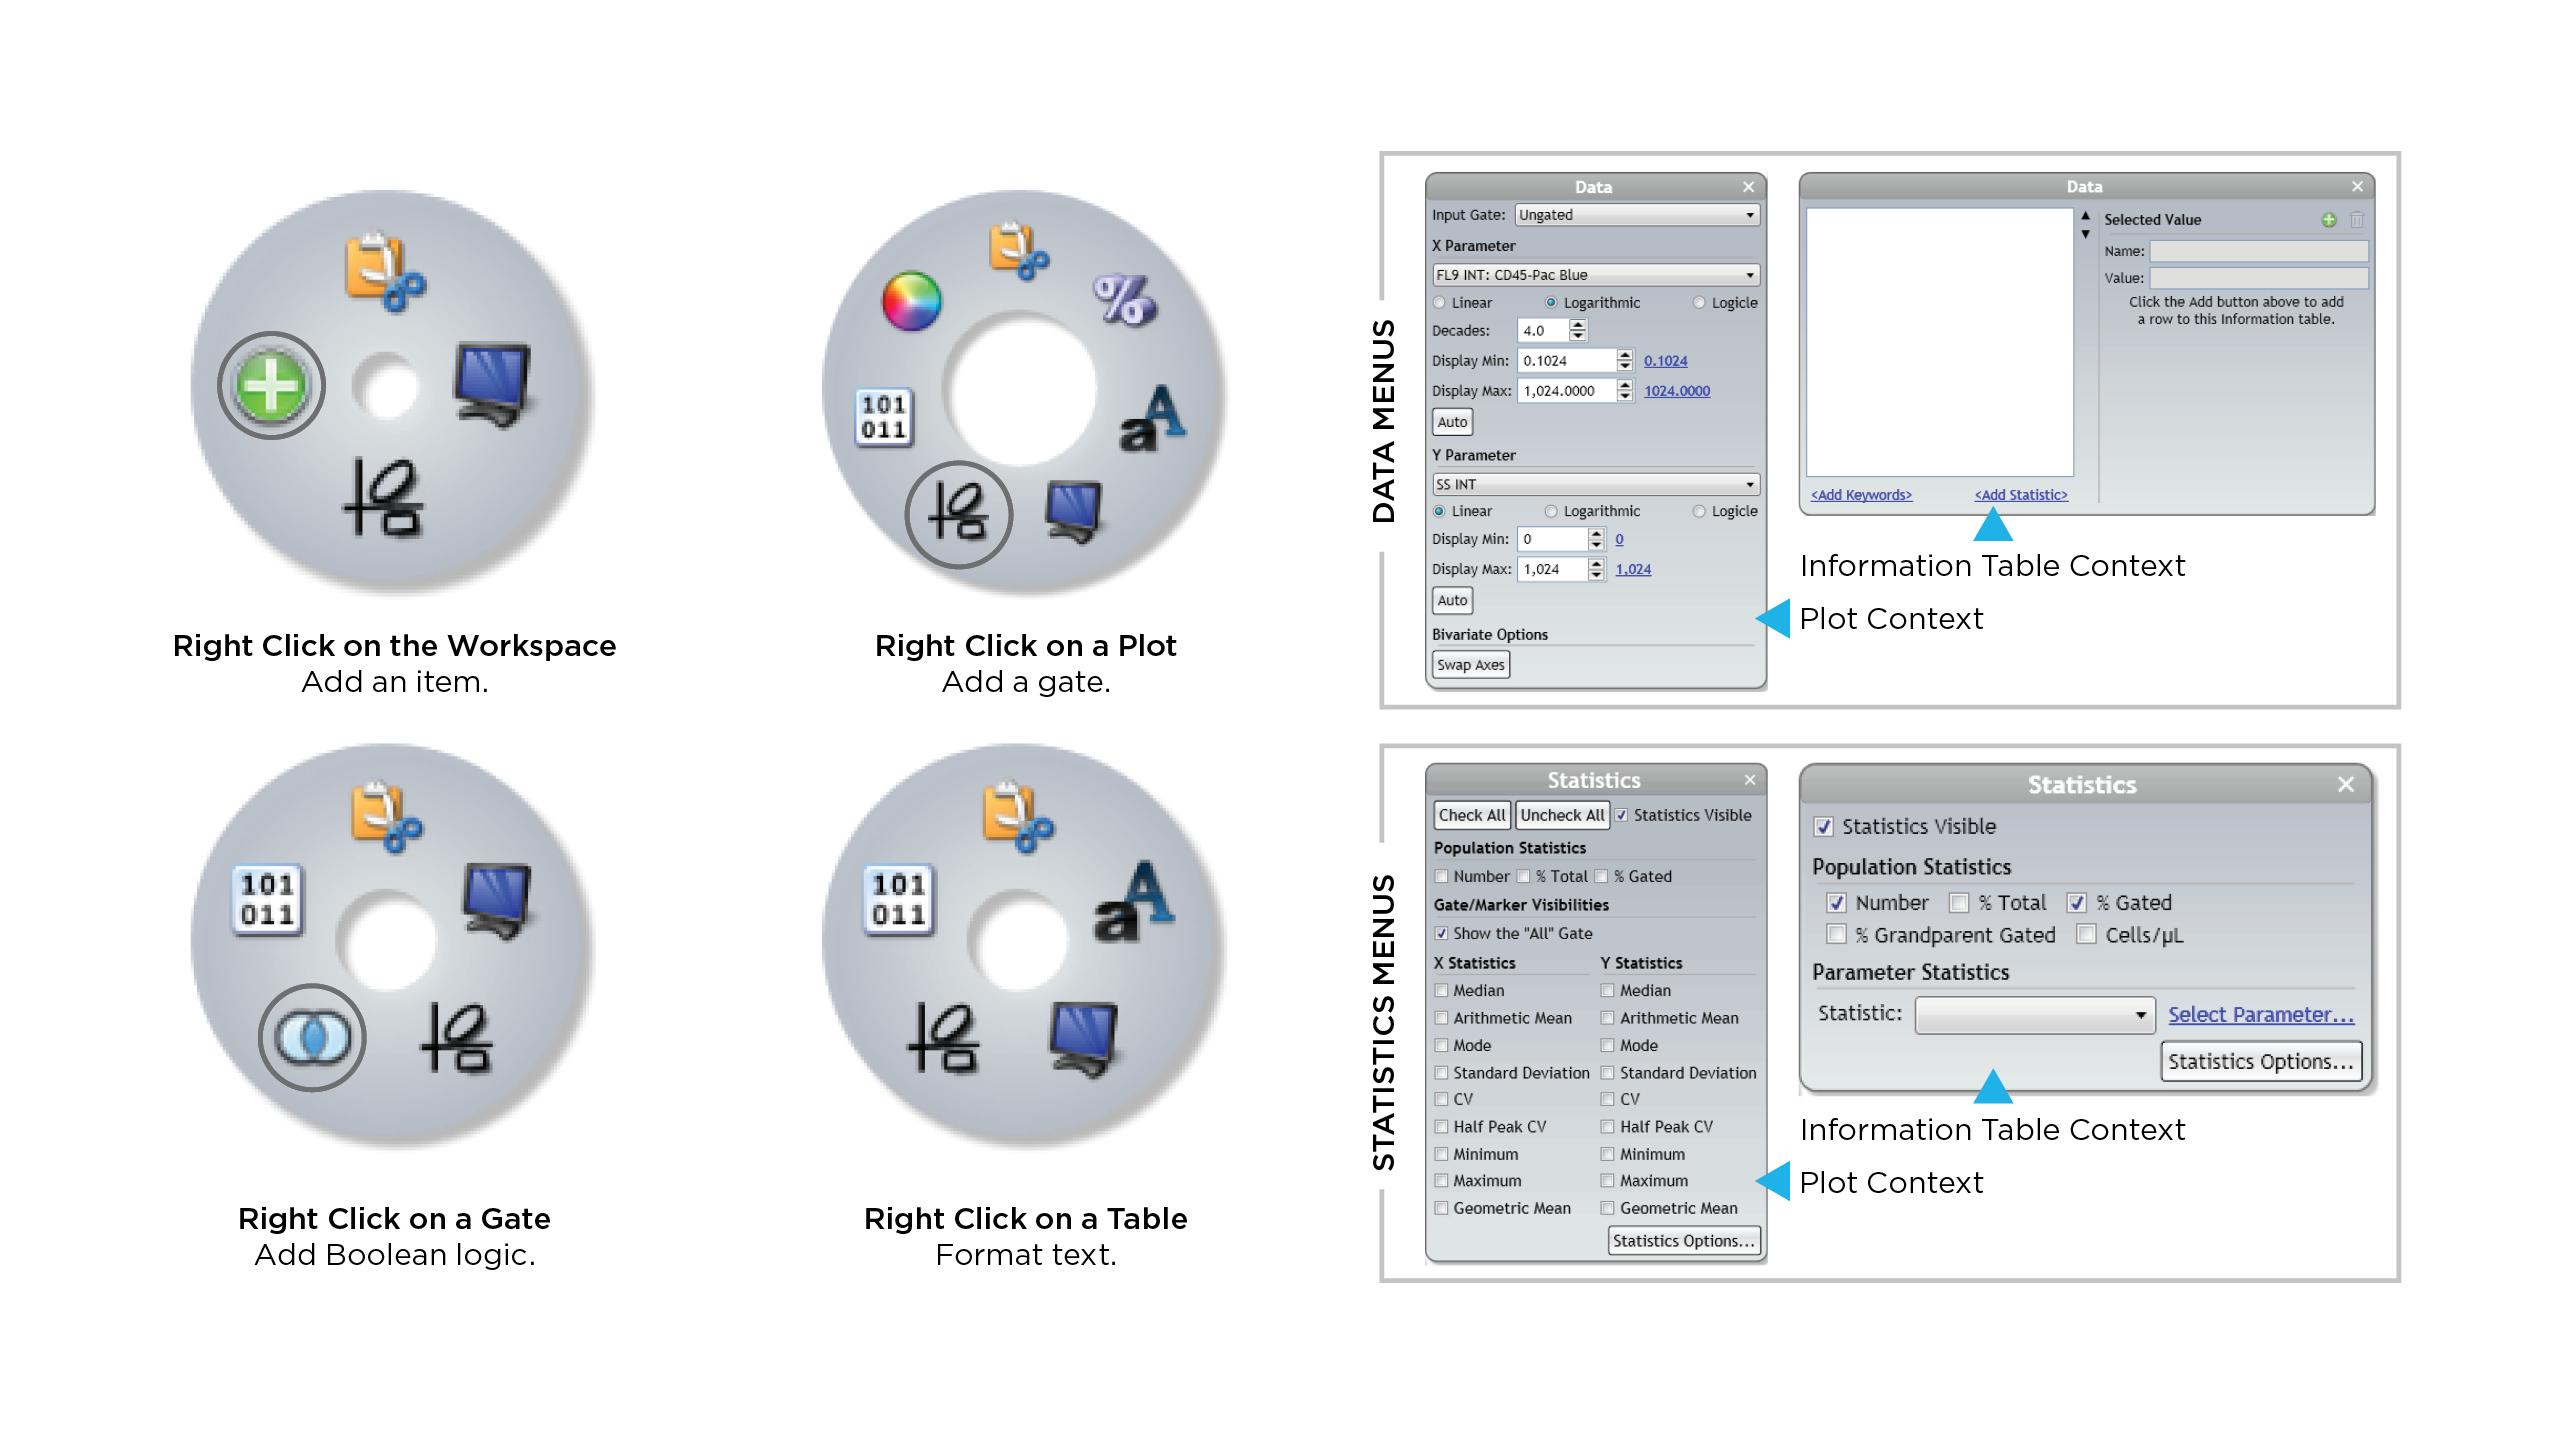 Kontextspezifische Radialmenüs der Kaluza Analysis-Software